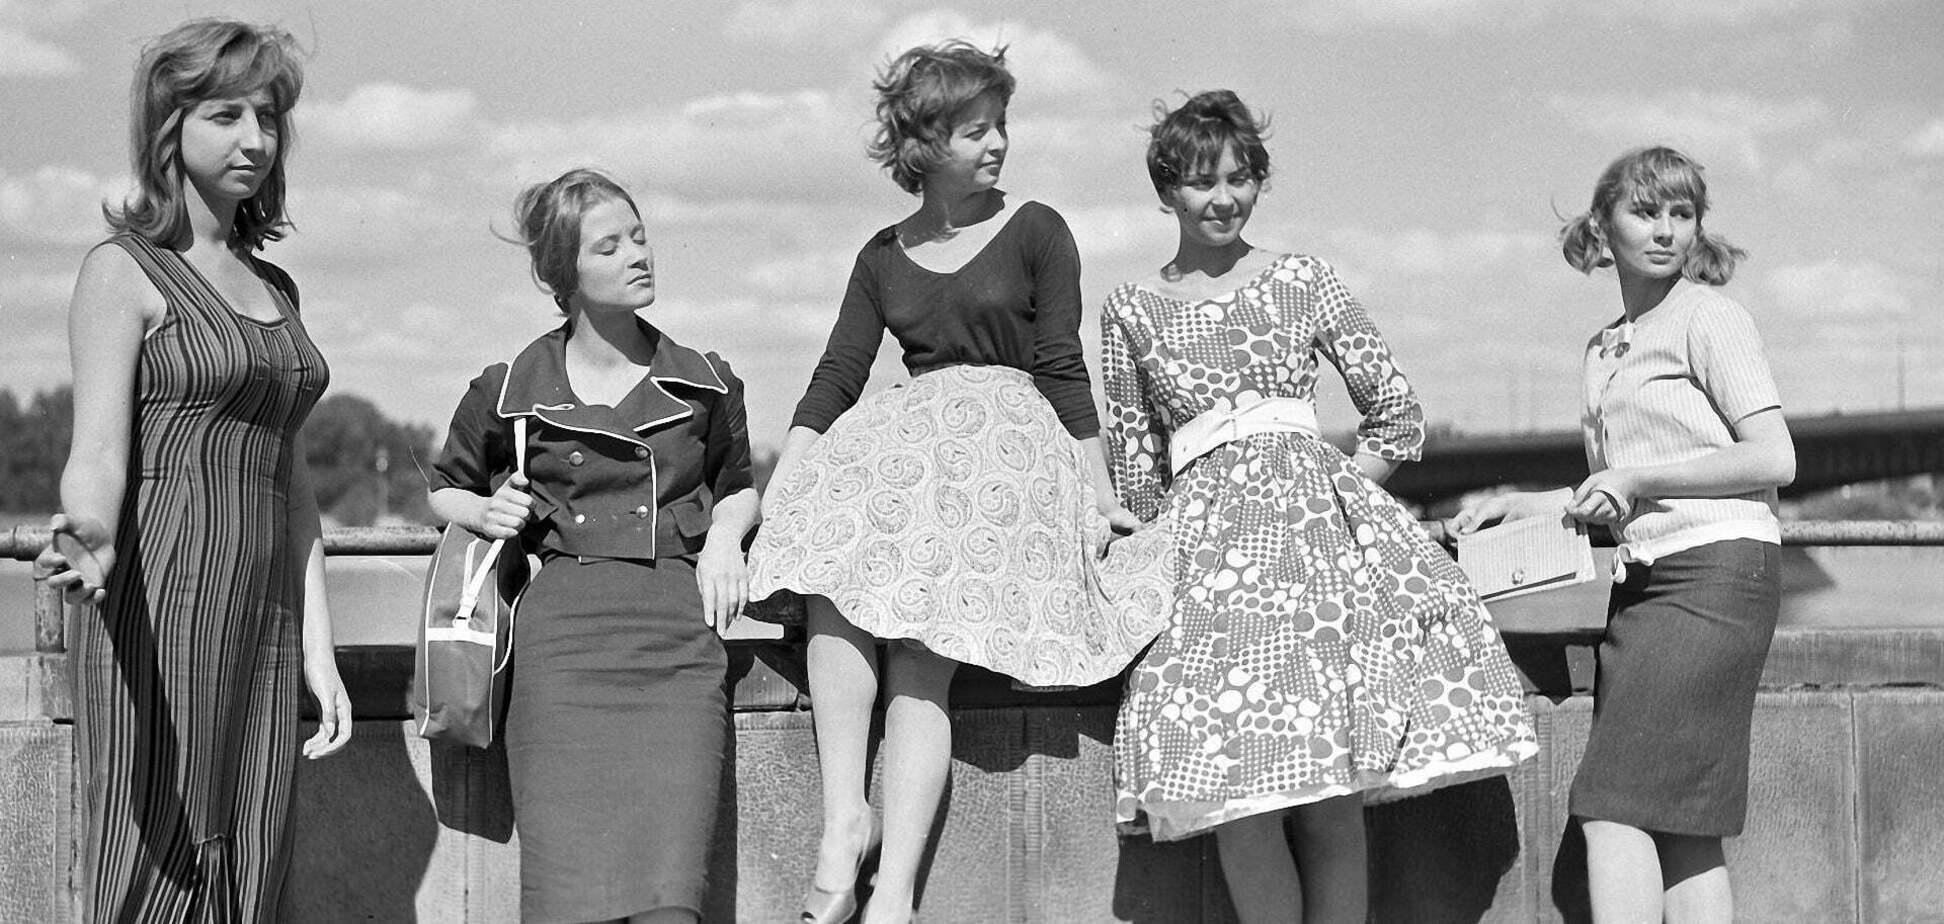 Откуда взялась легендарная фраза 'в СССР секса нет': опубликовано видео